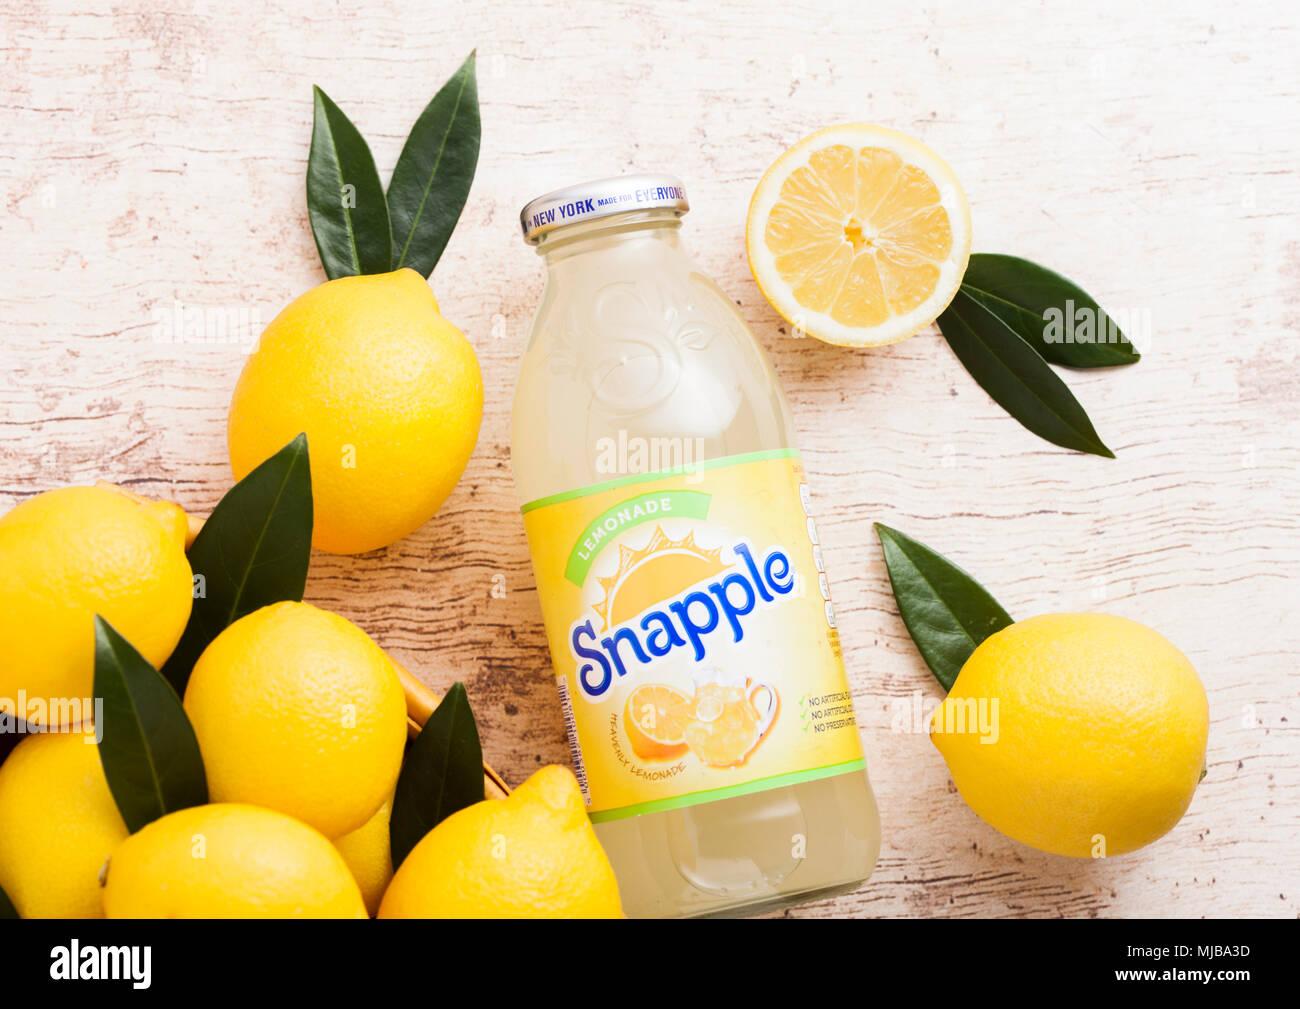 LONDON, UK - APRIL 27, 2018: Bottle of Snapple lemon juice on wooden